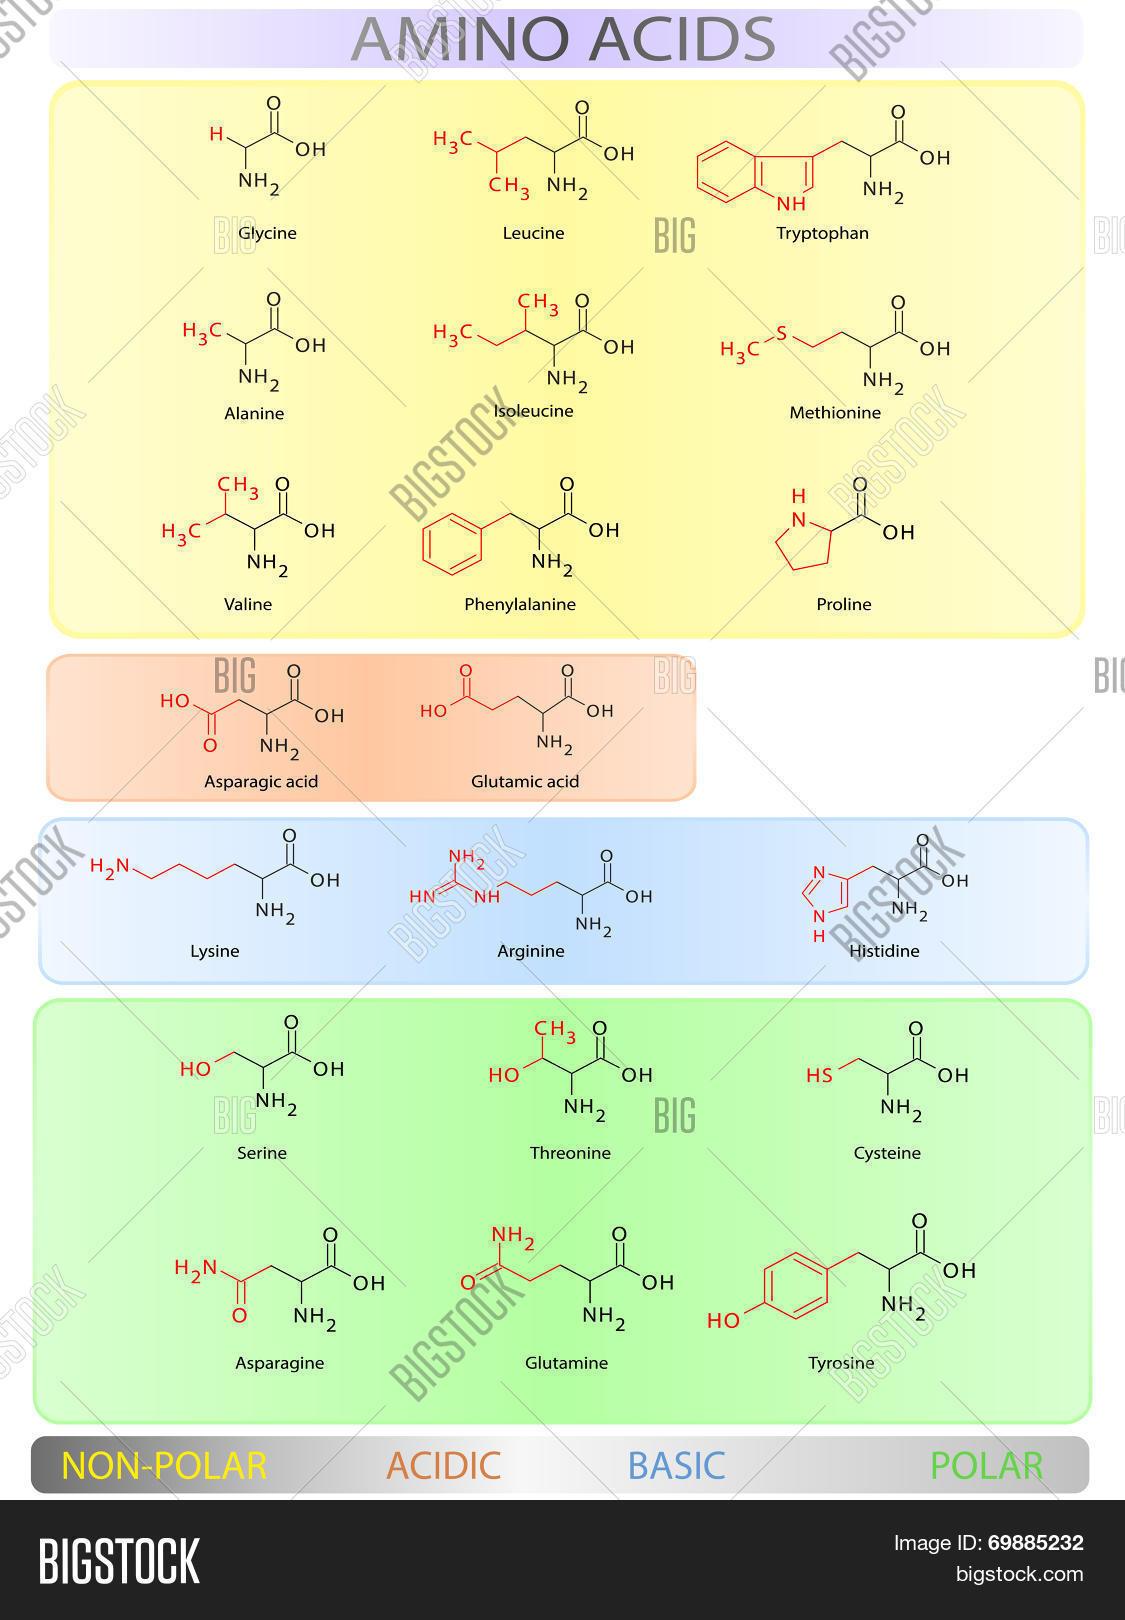 Tremendous Amino Acids Table Vector Photo Free Trial Bigstock Download Free Architecture Designs Embacsunscenecom